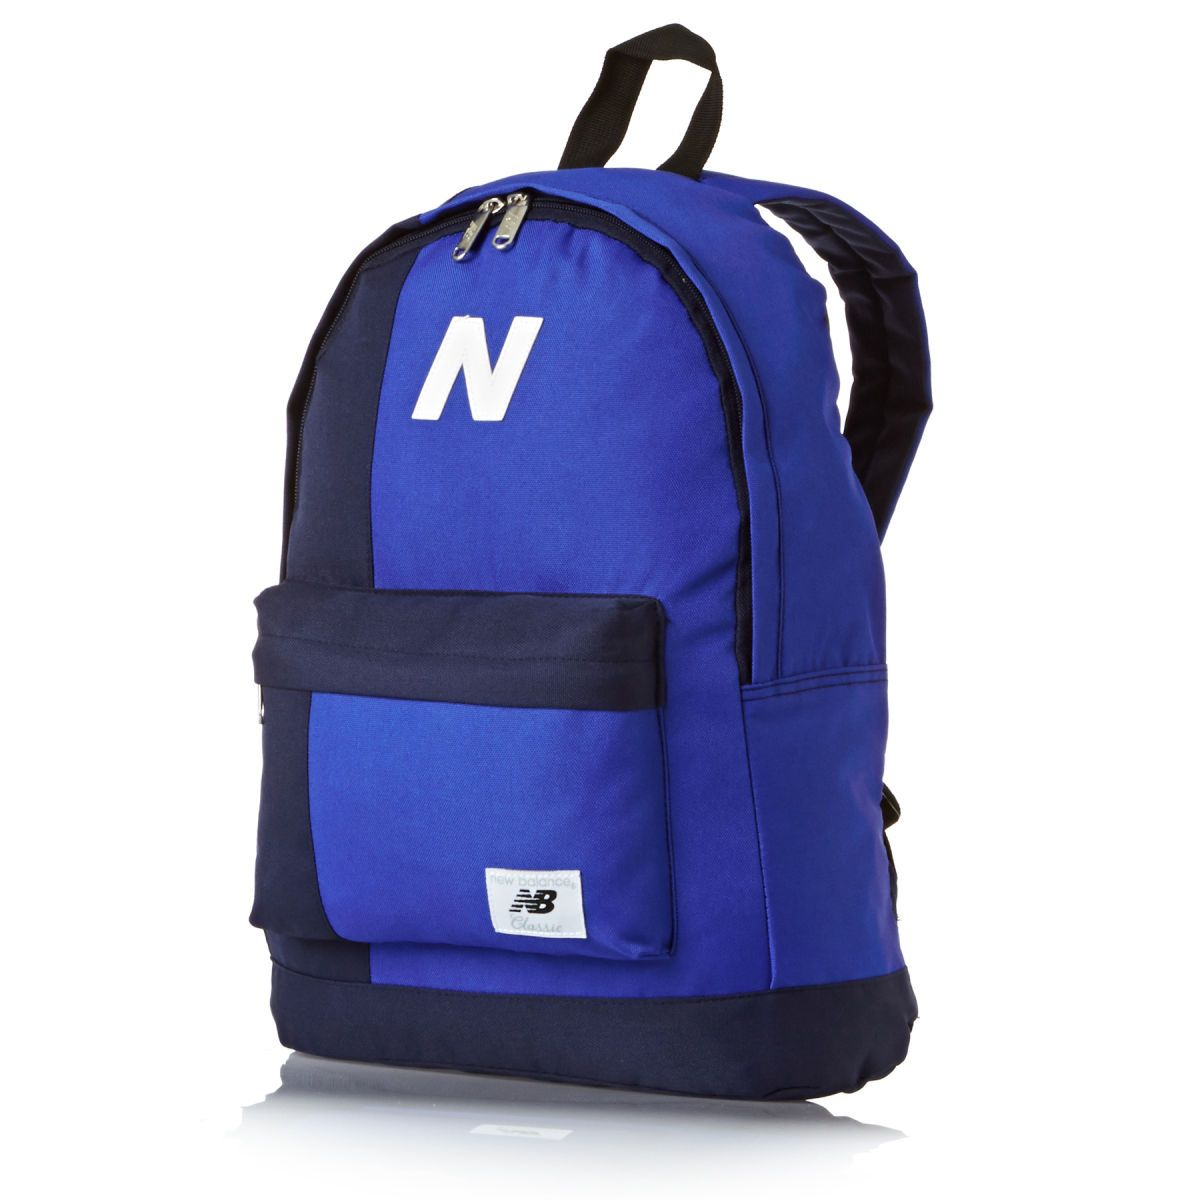 d8ce3941fac New Balance Mellow Asymmetric Backpack - Royal/Navy   hat's on ...